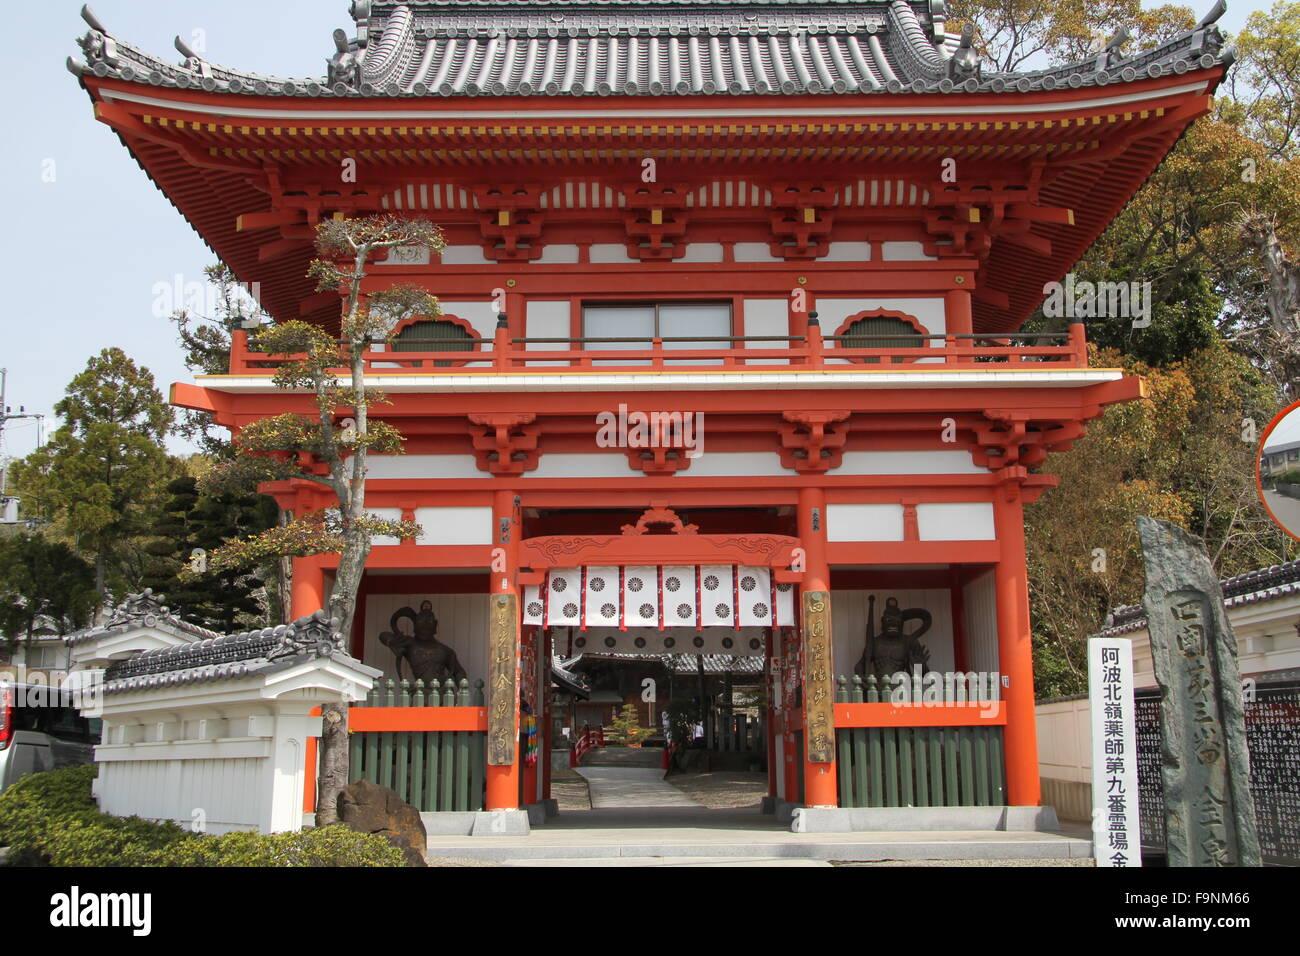 Temple gate, Shikoku Photo Stock